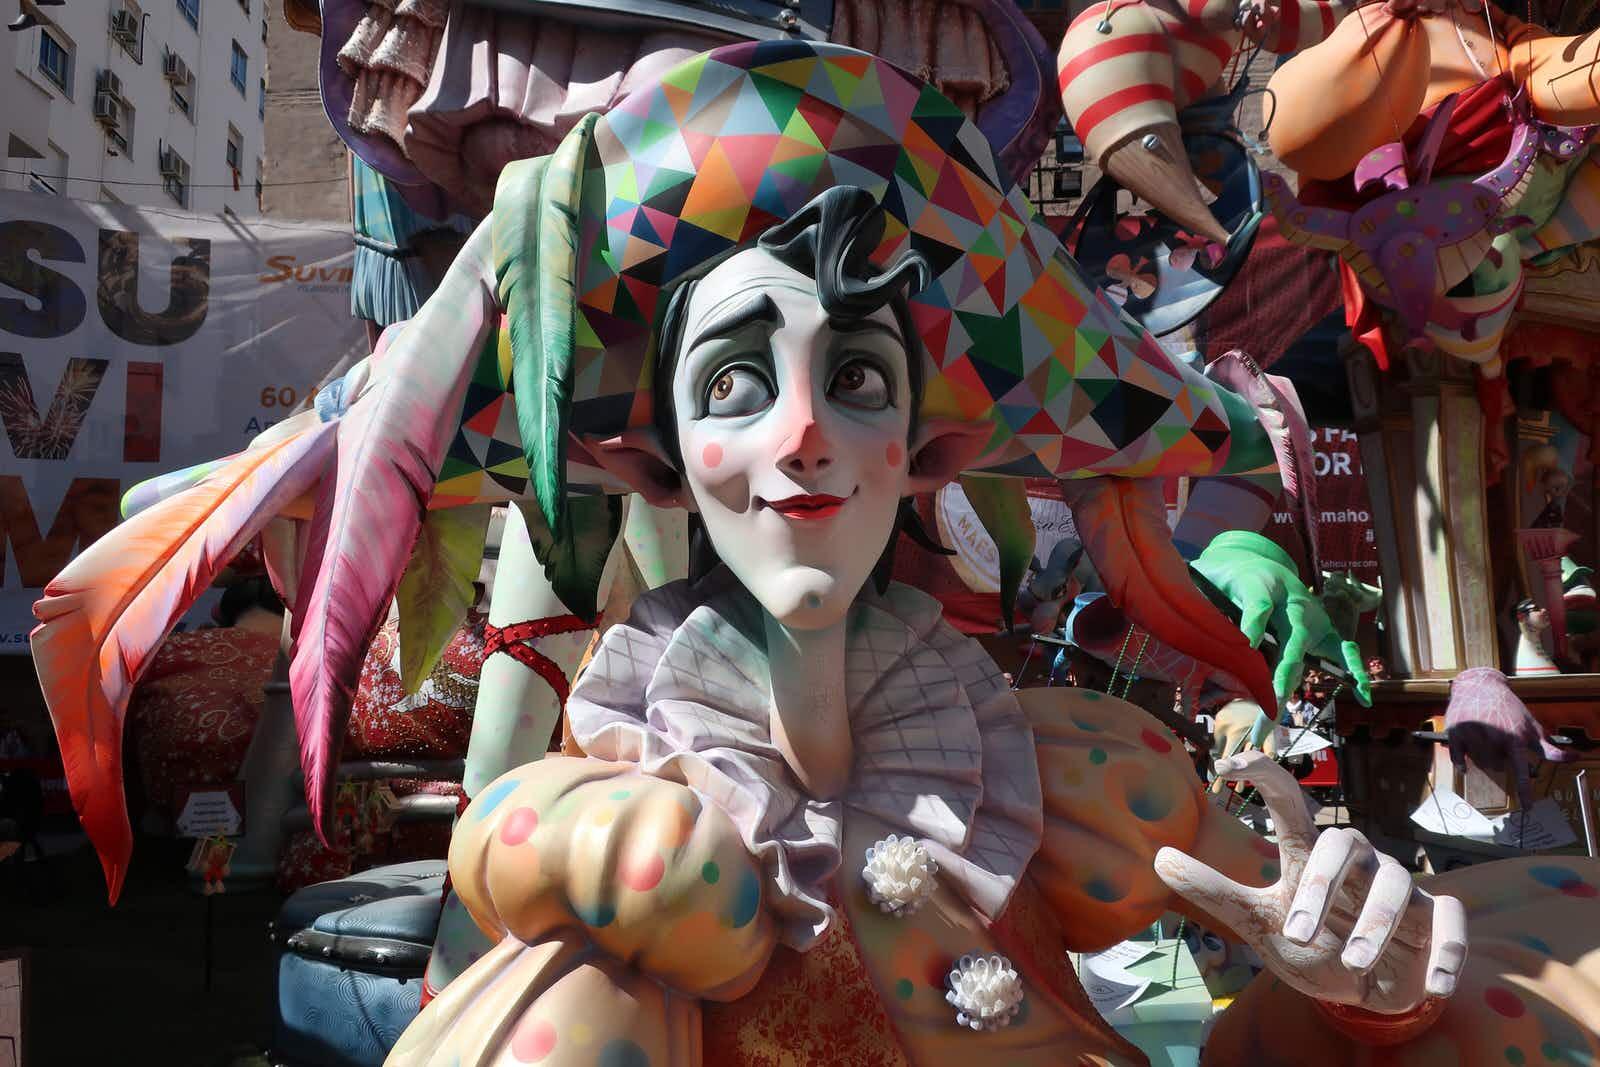 Experience the fiery fun of Las Fallas in Valencia